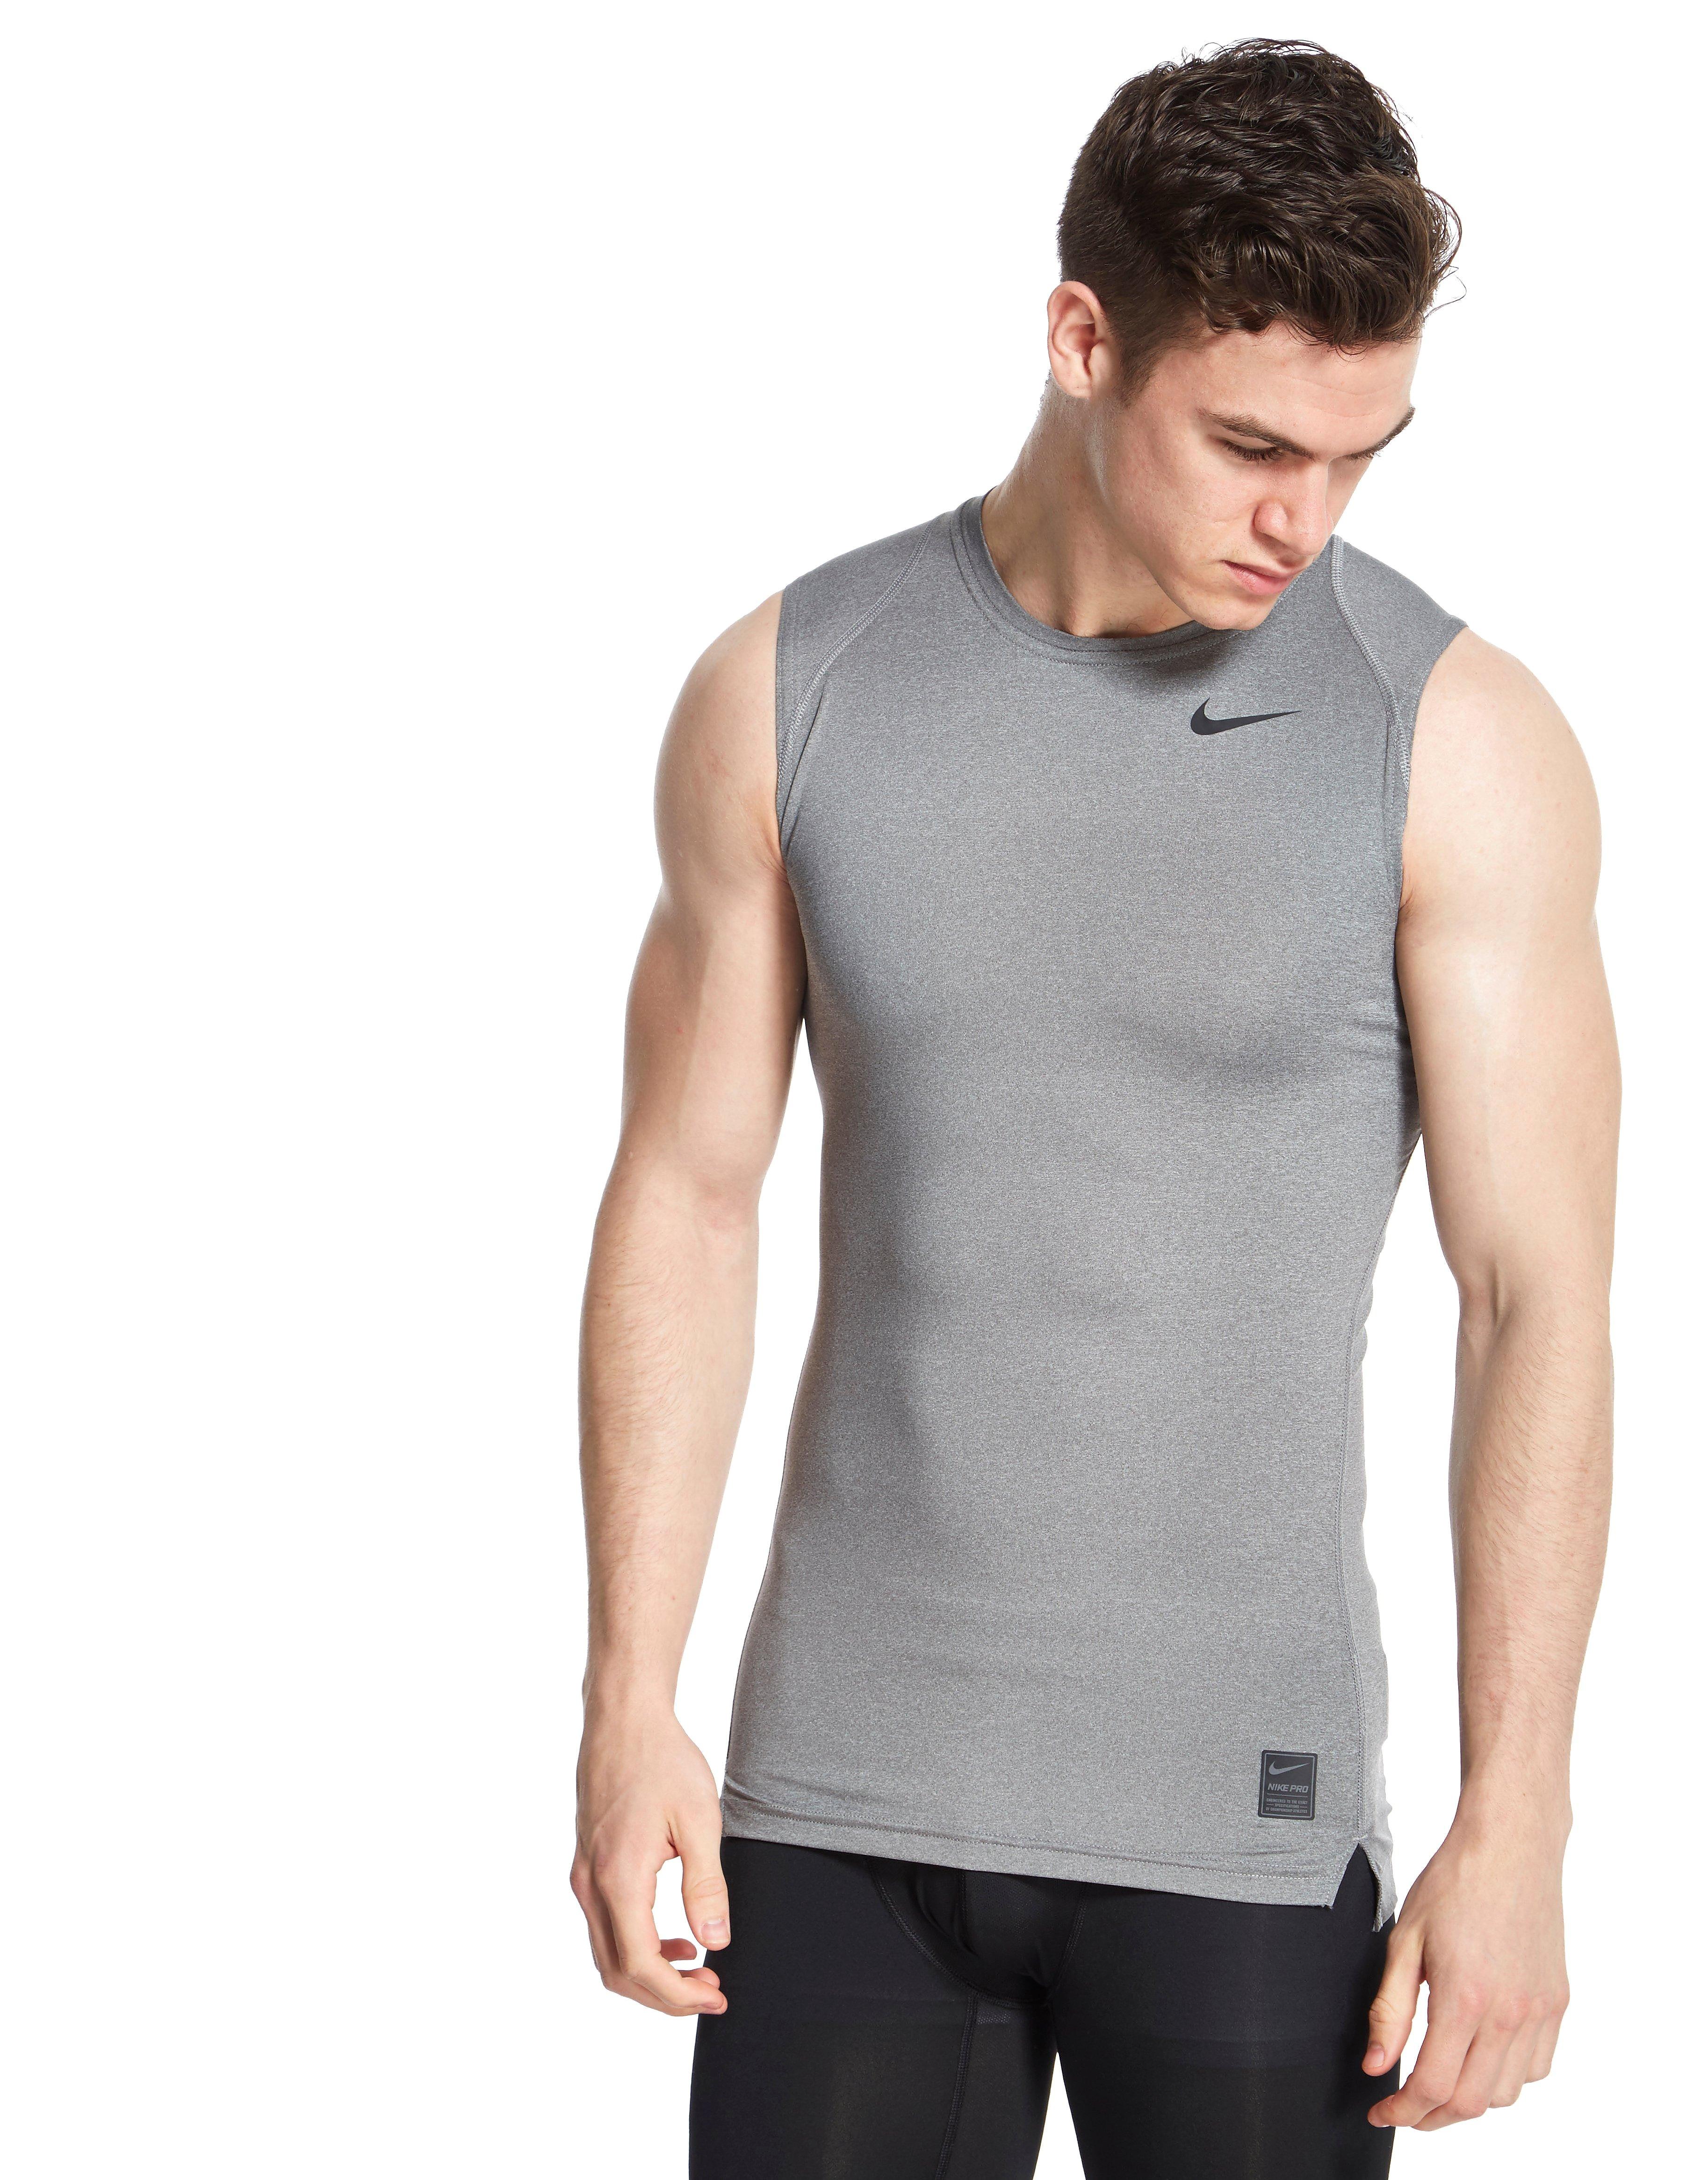 Nike Pro Compression Sleeveless T-Shirt